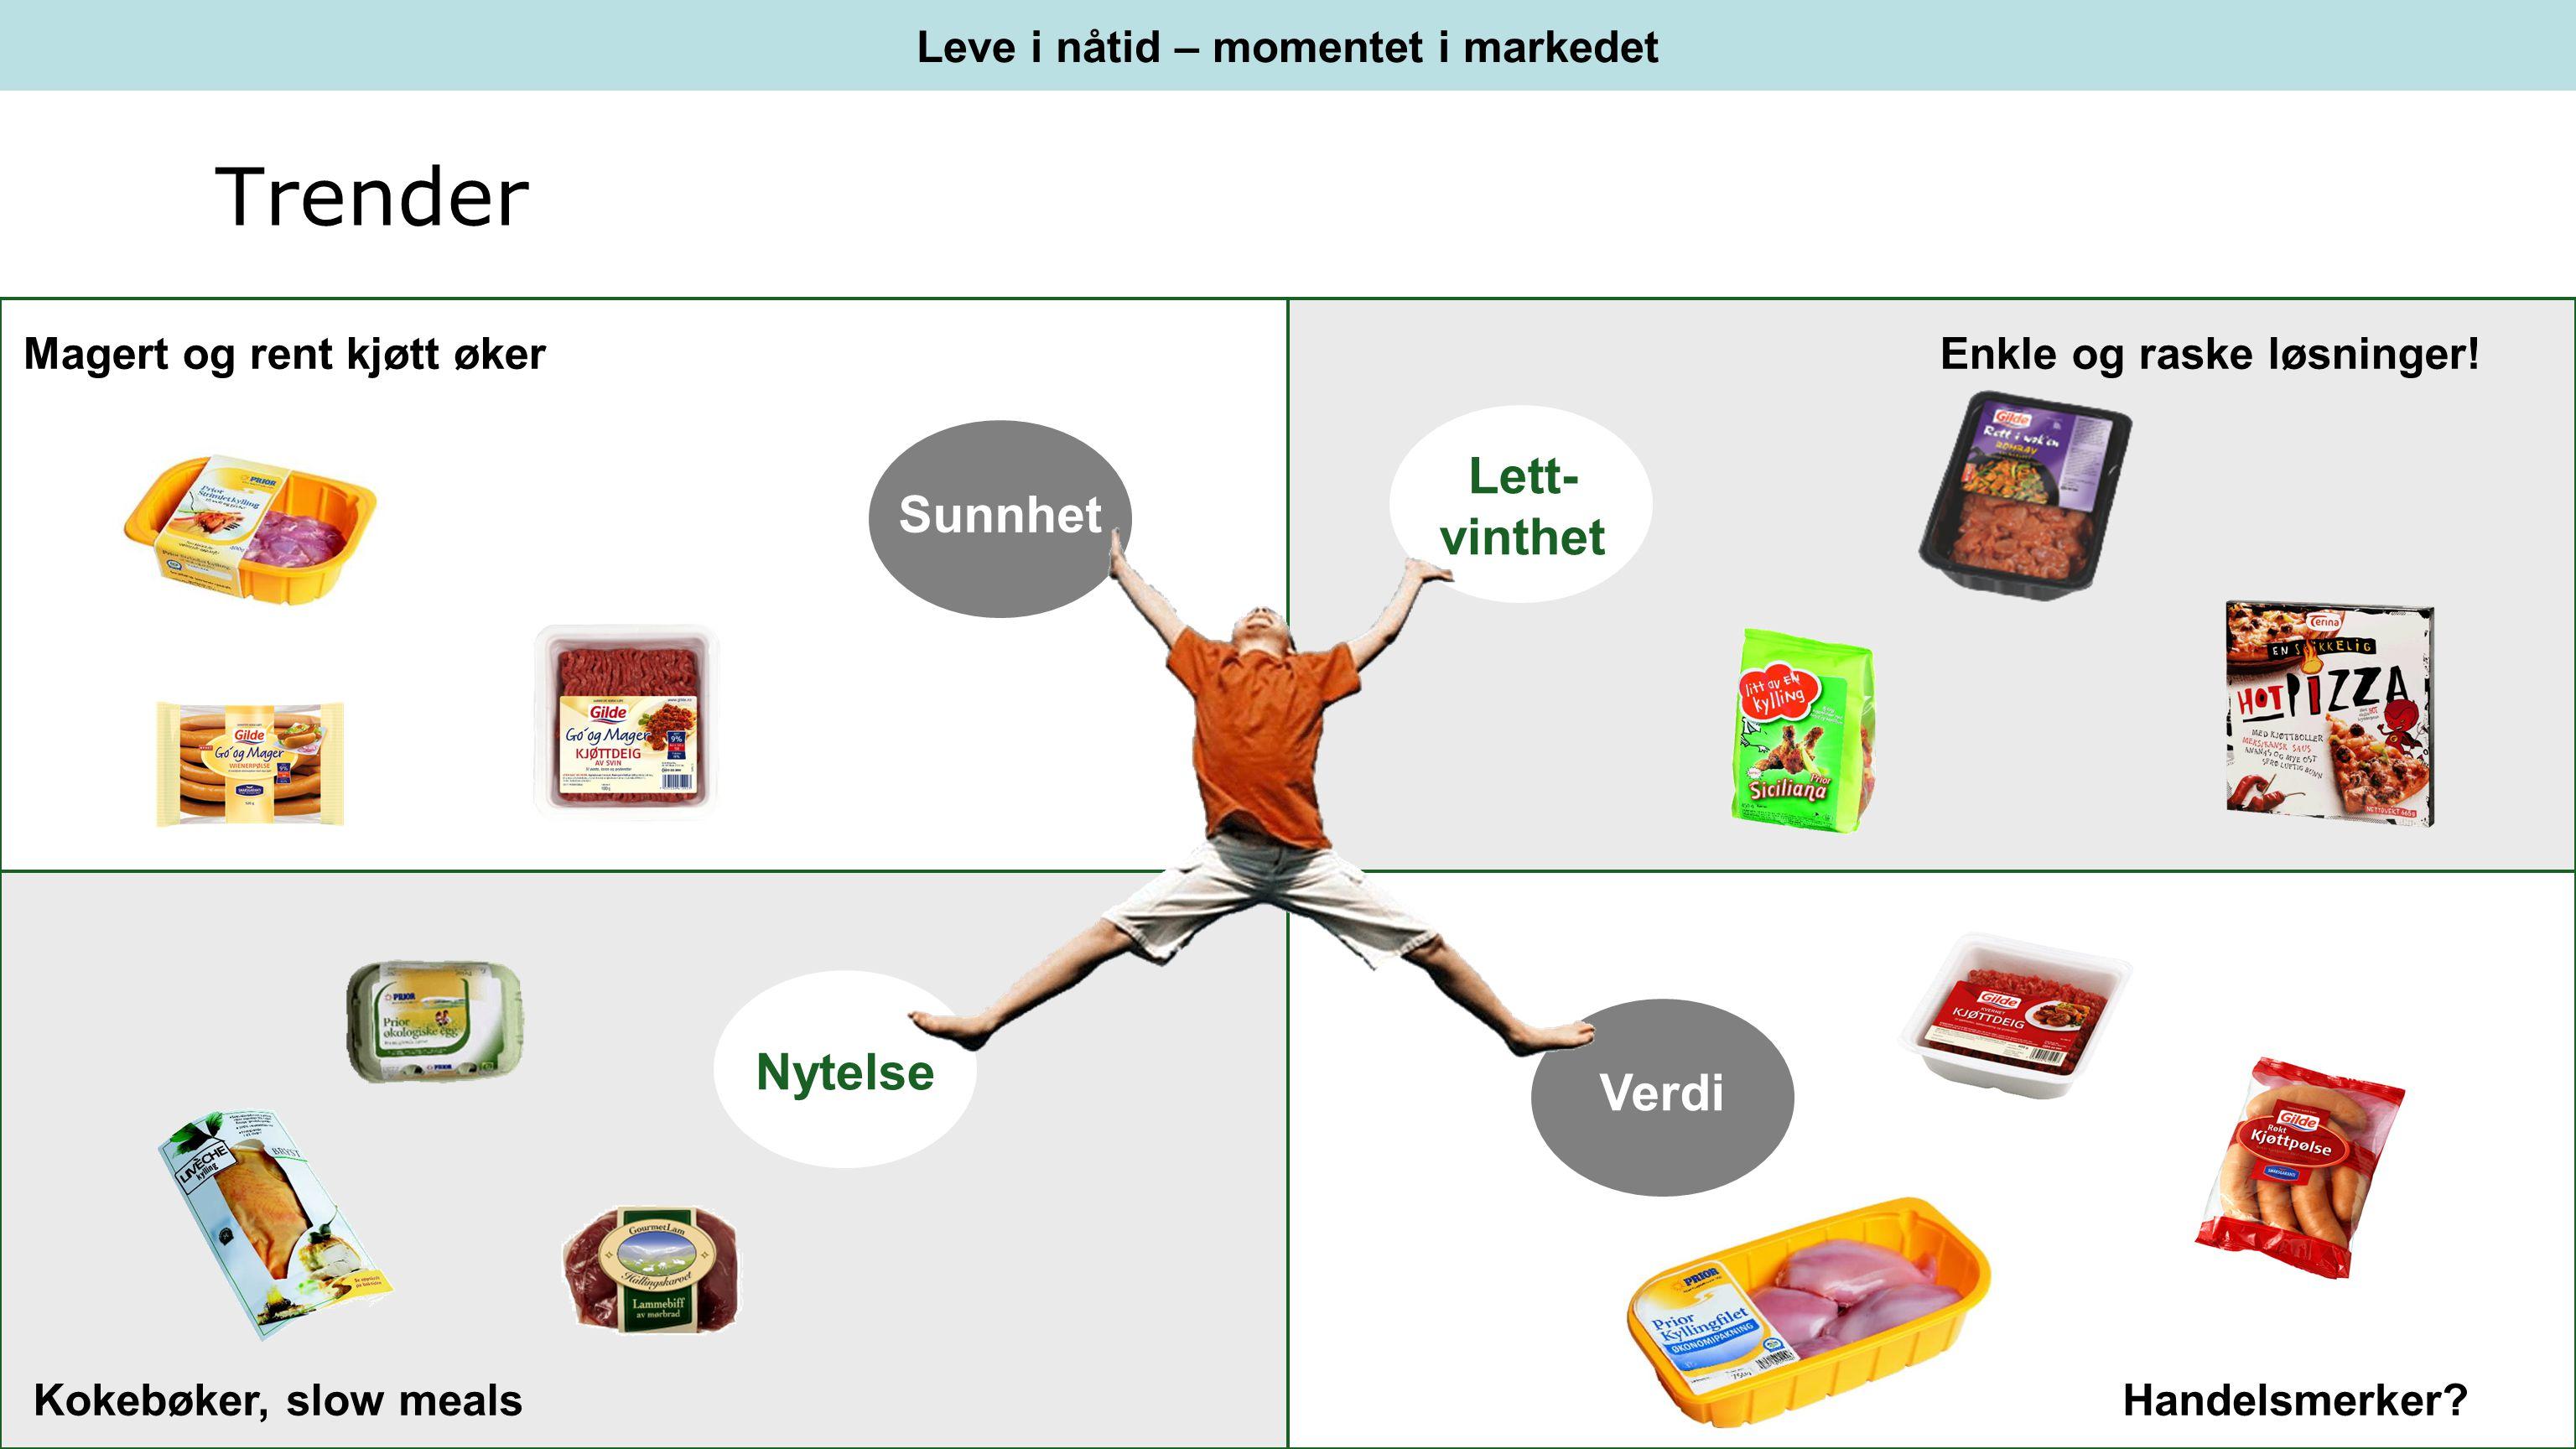 Leve i nåtid – momentet i markedet